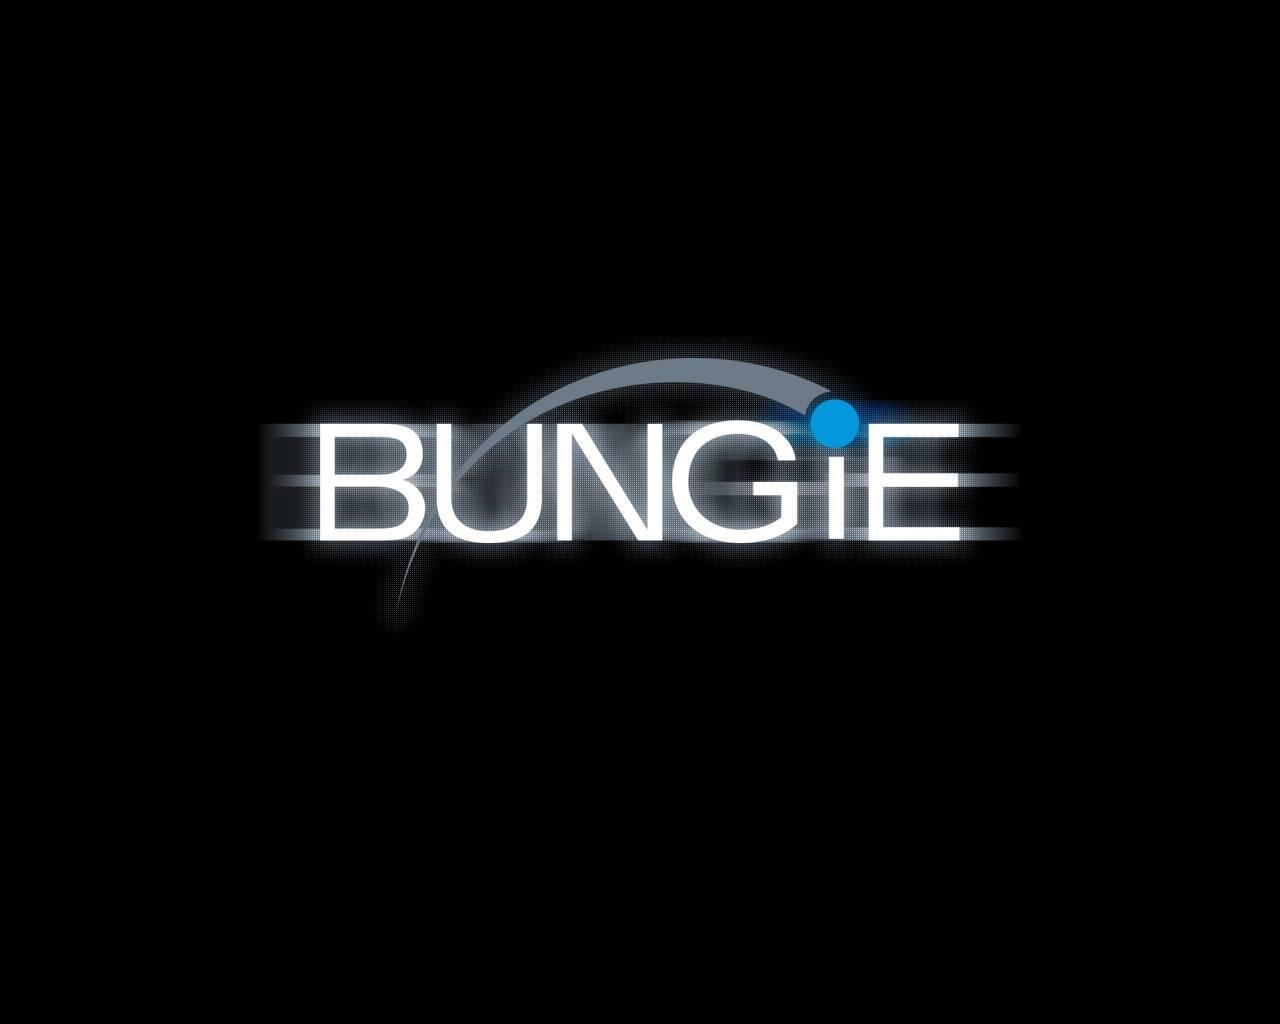 BungieLogo-1